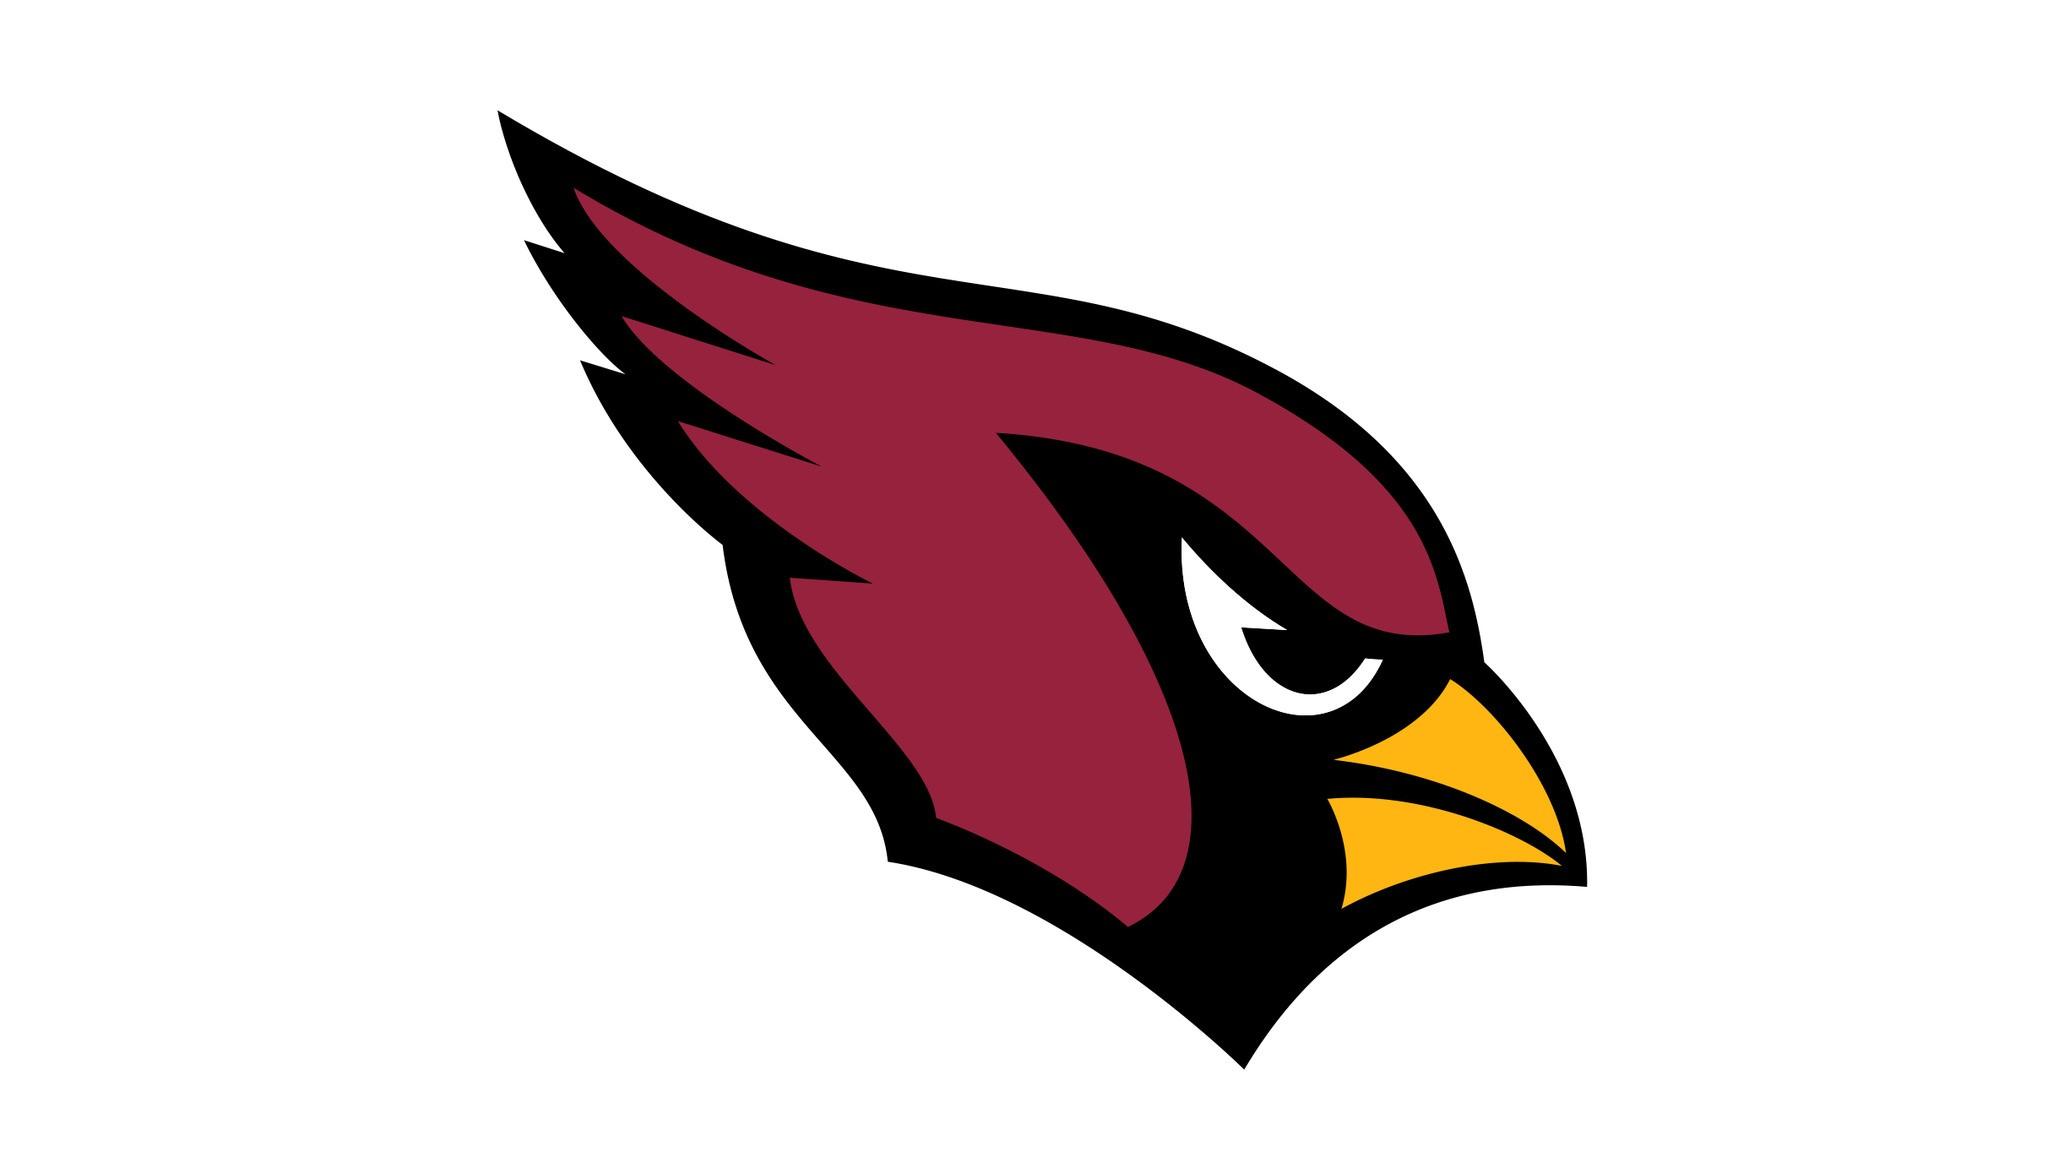 2048x1152 Arizona Cardinals Vs. Seattle Seahawks University Of Phoenix